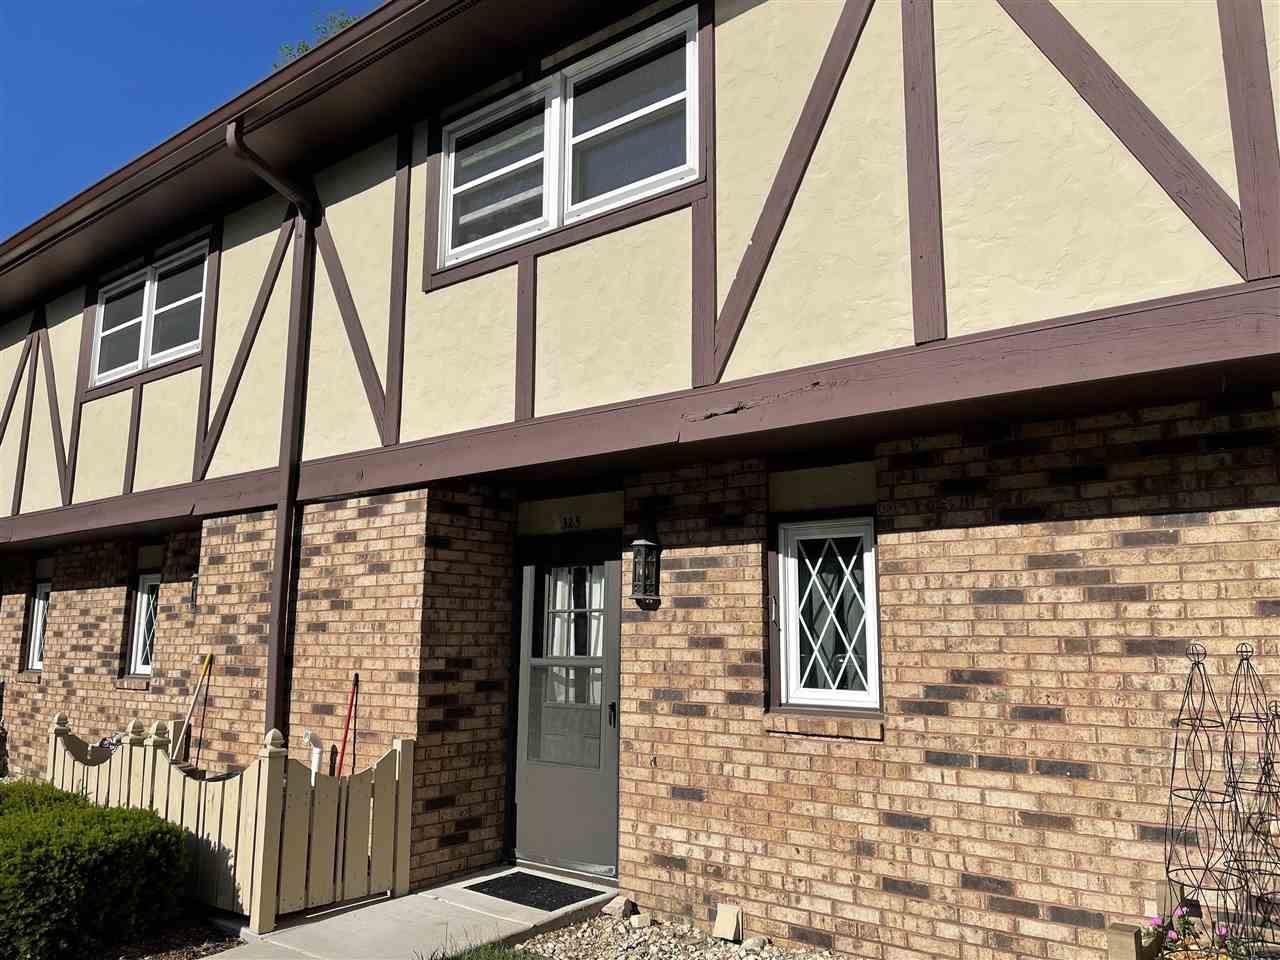 f_1911994 Real Estate in 53534 zip code